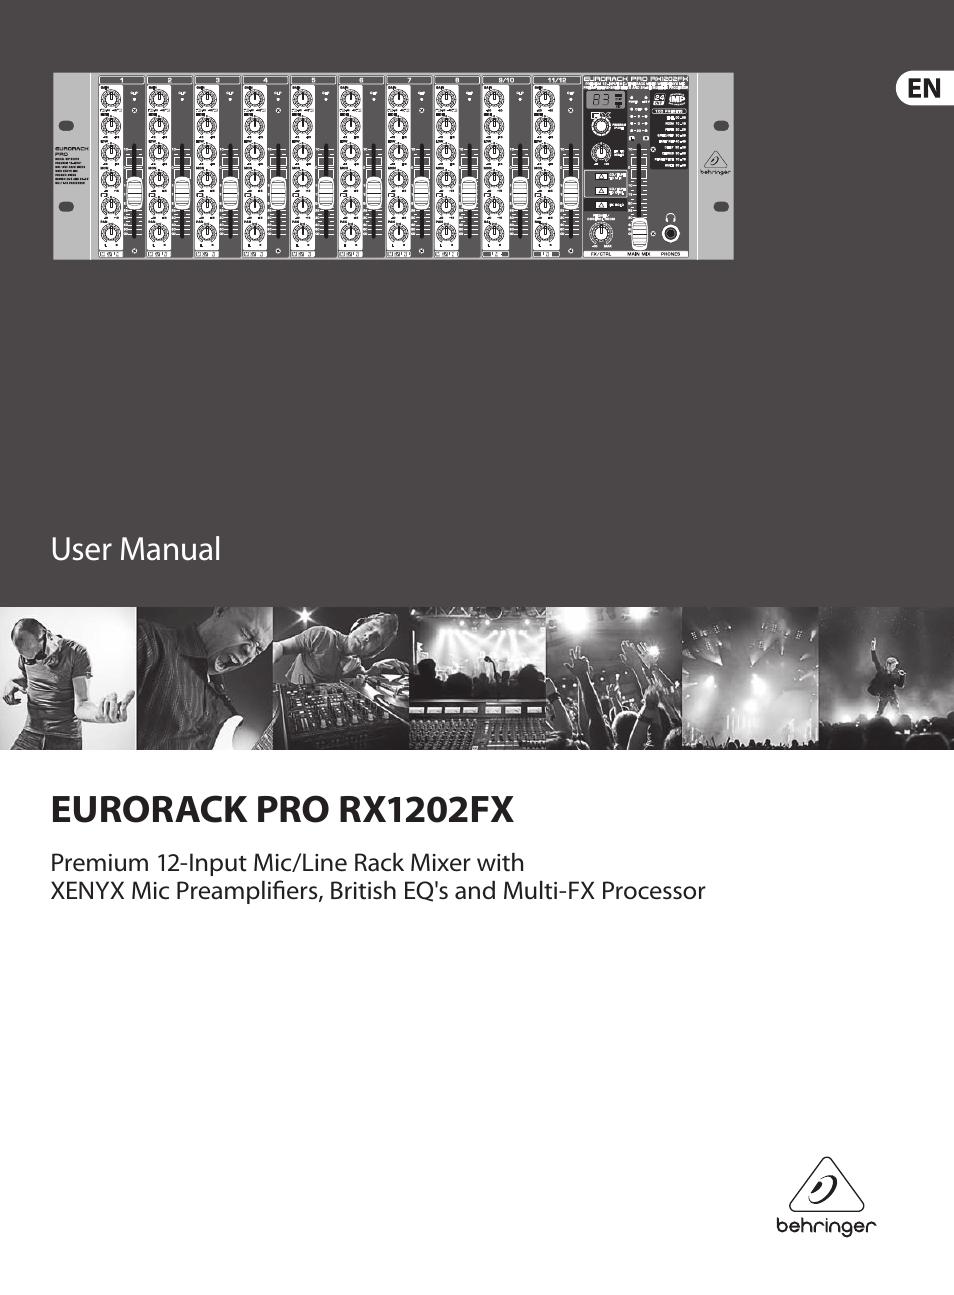 behringer eurorack pro rx1202fx user manual 16 pages rh manualsdir com Behringer Rack Mixer Behringer DJ Mixer